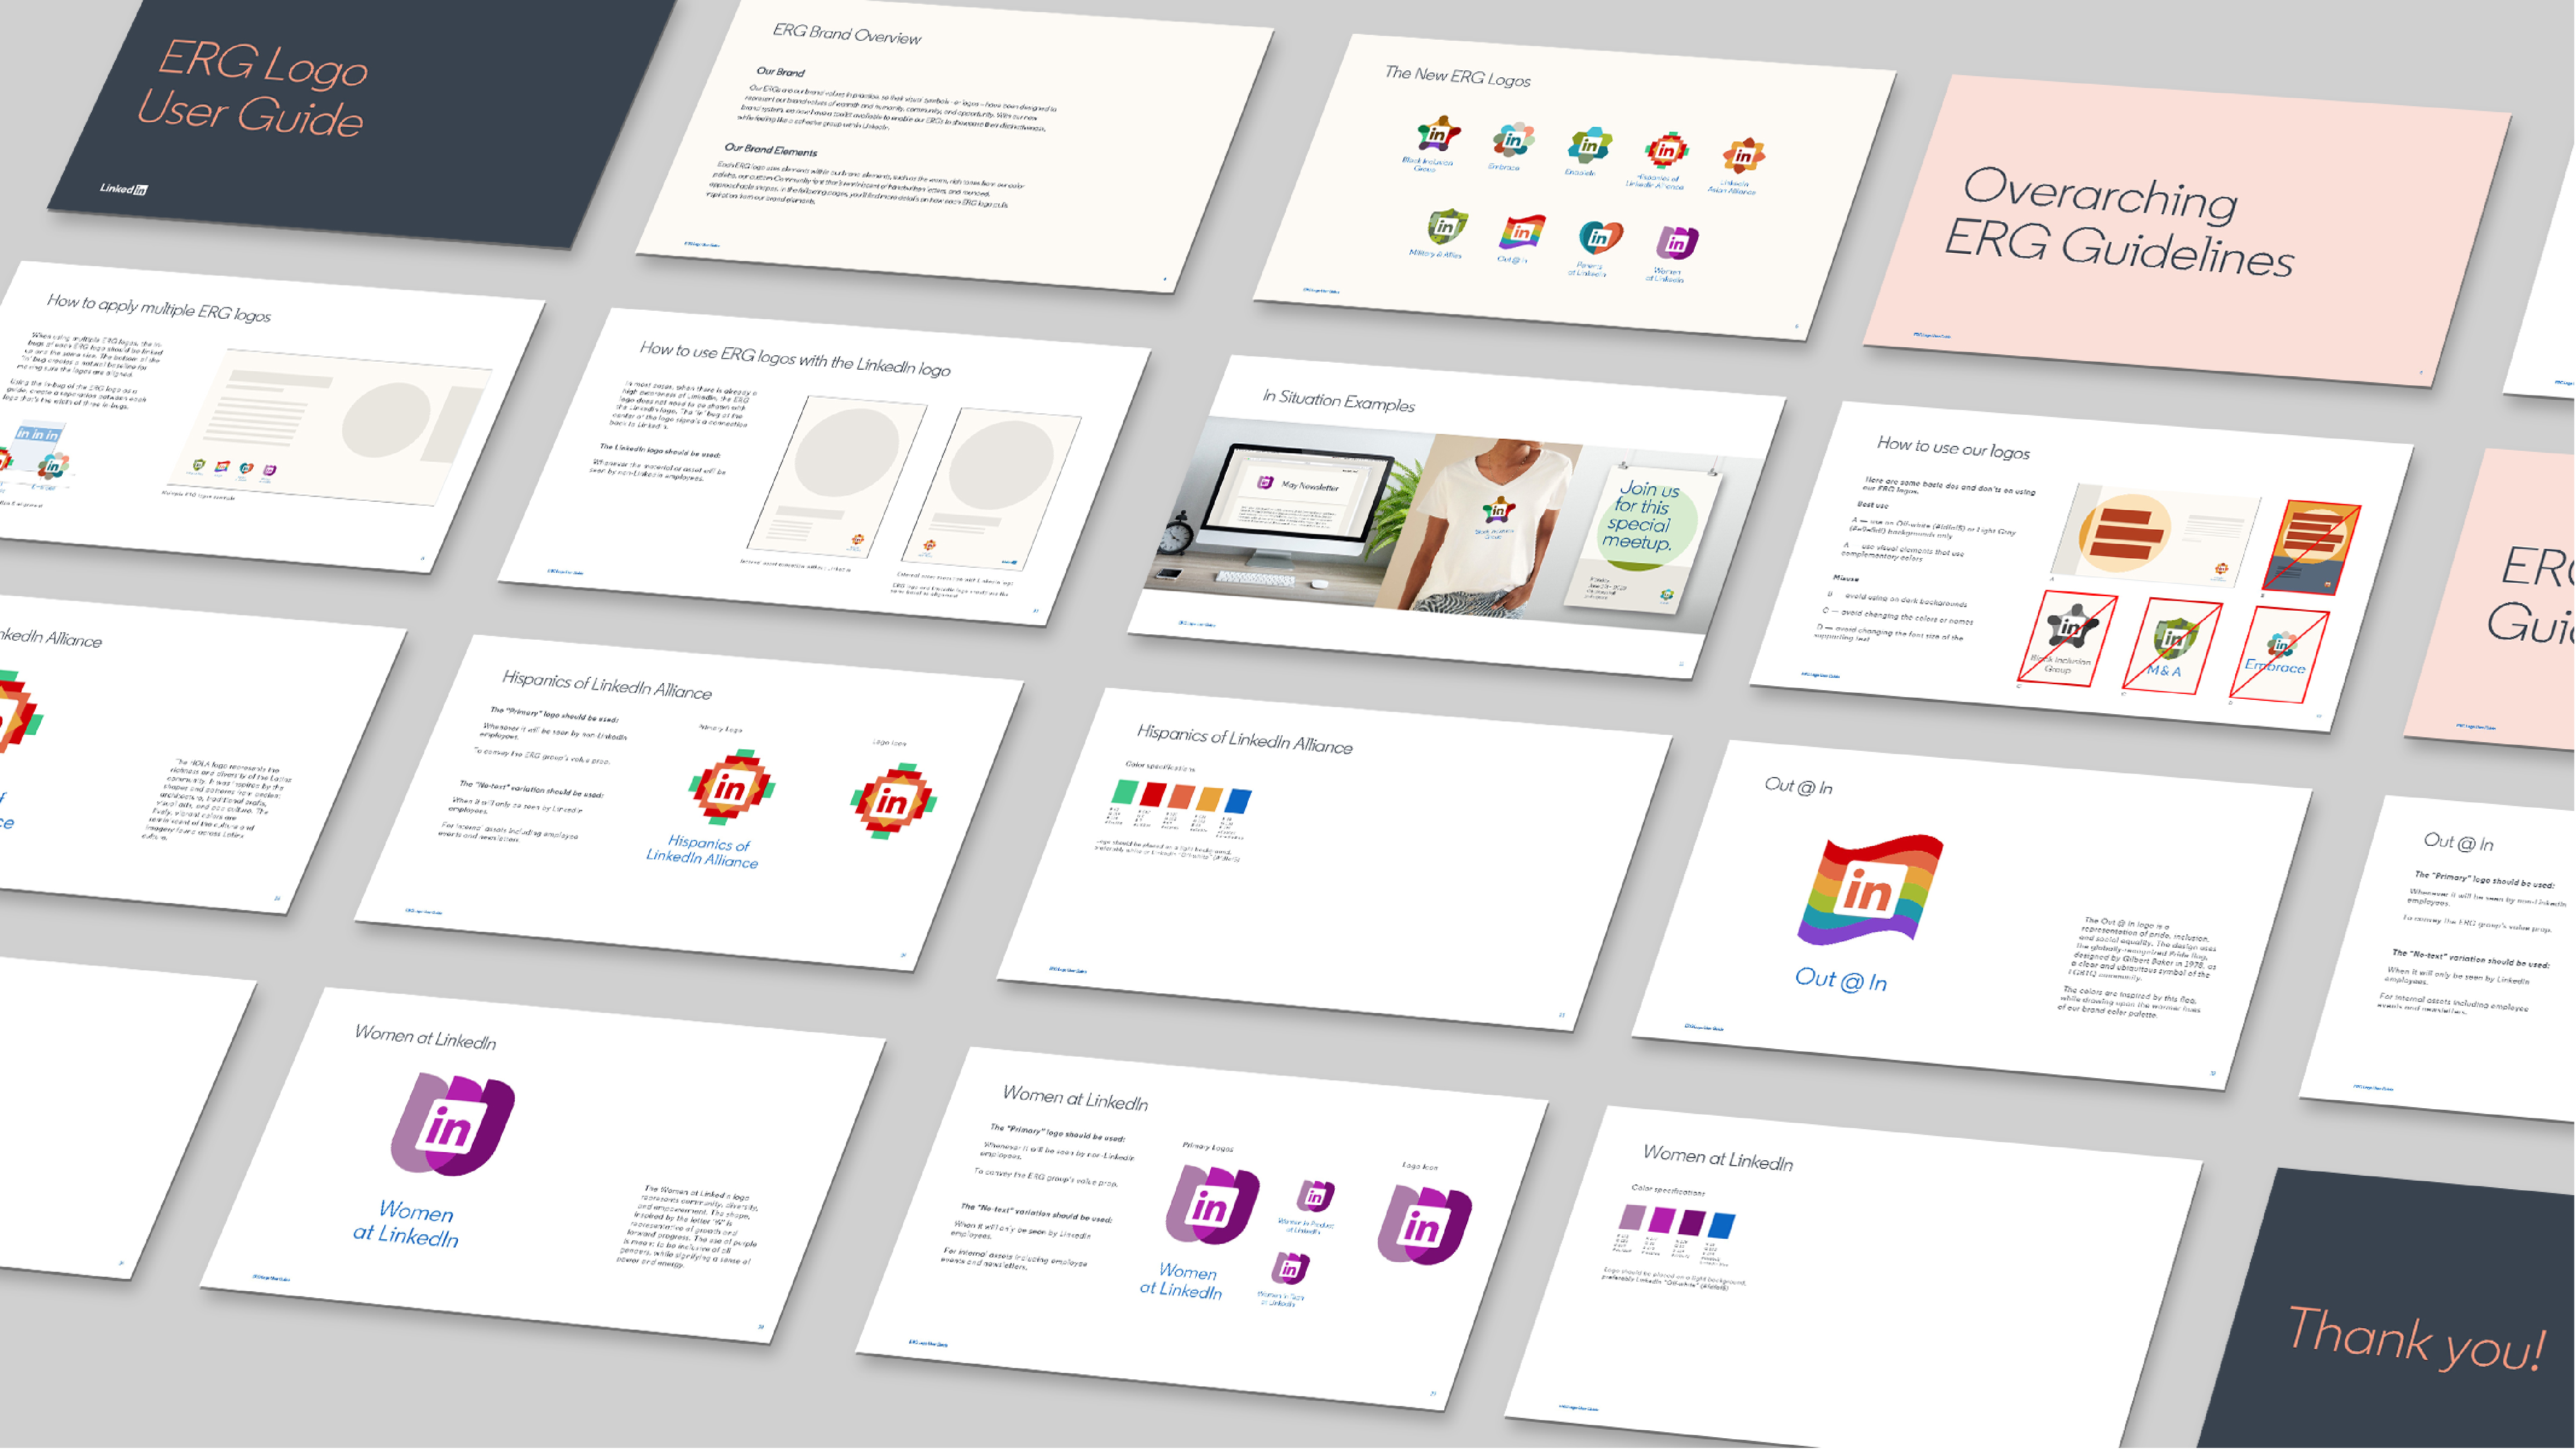 LinkedIn Employee Resource Group brand guidelines